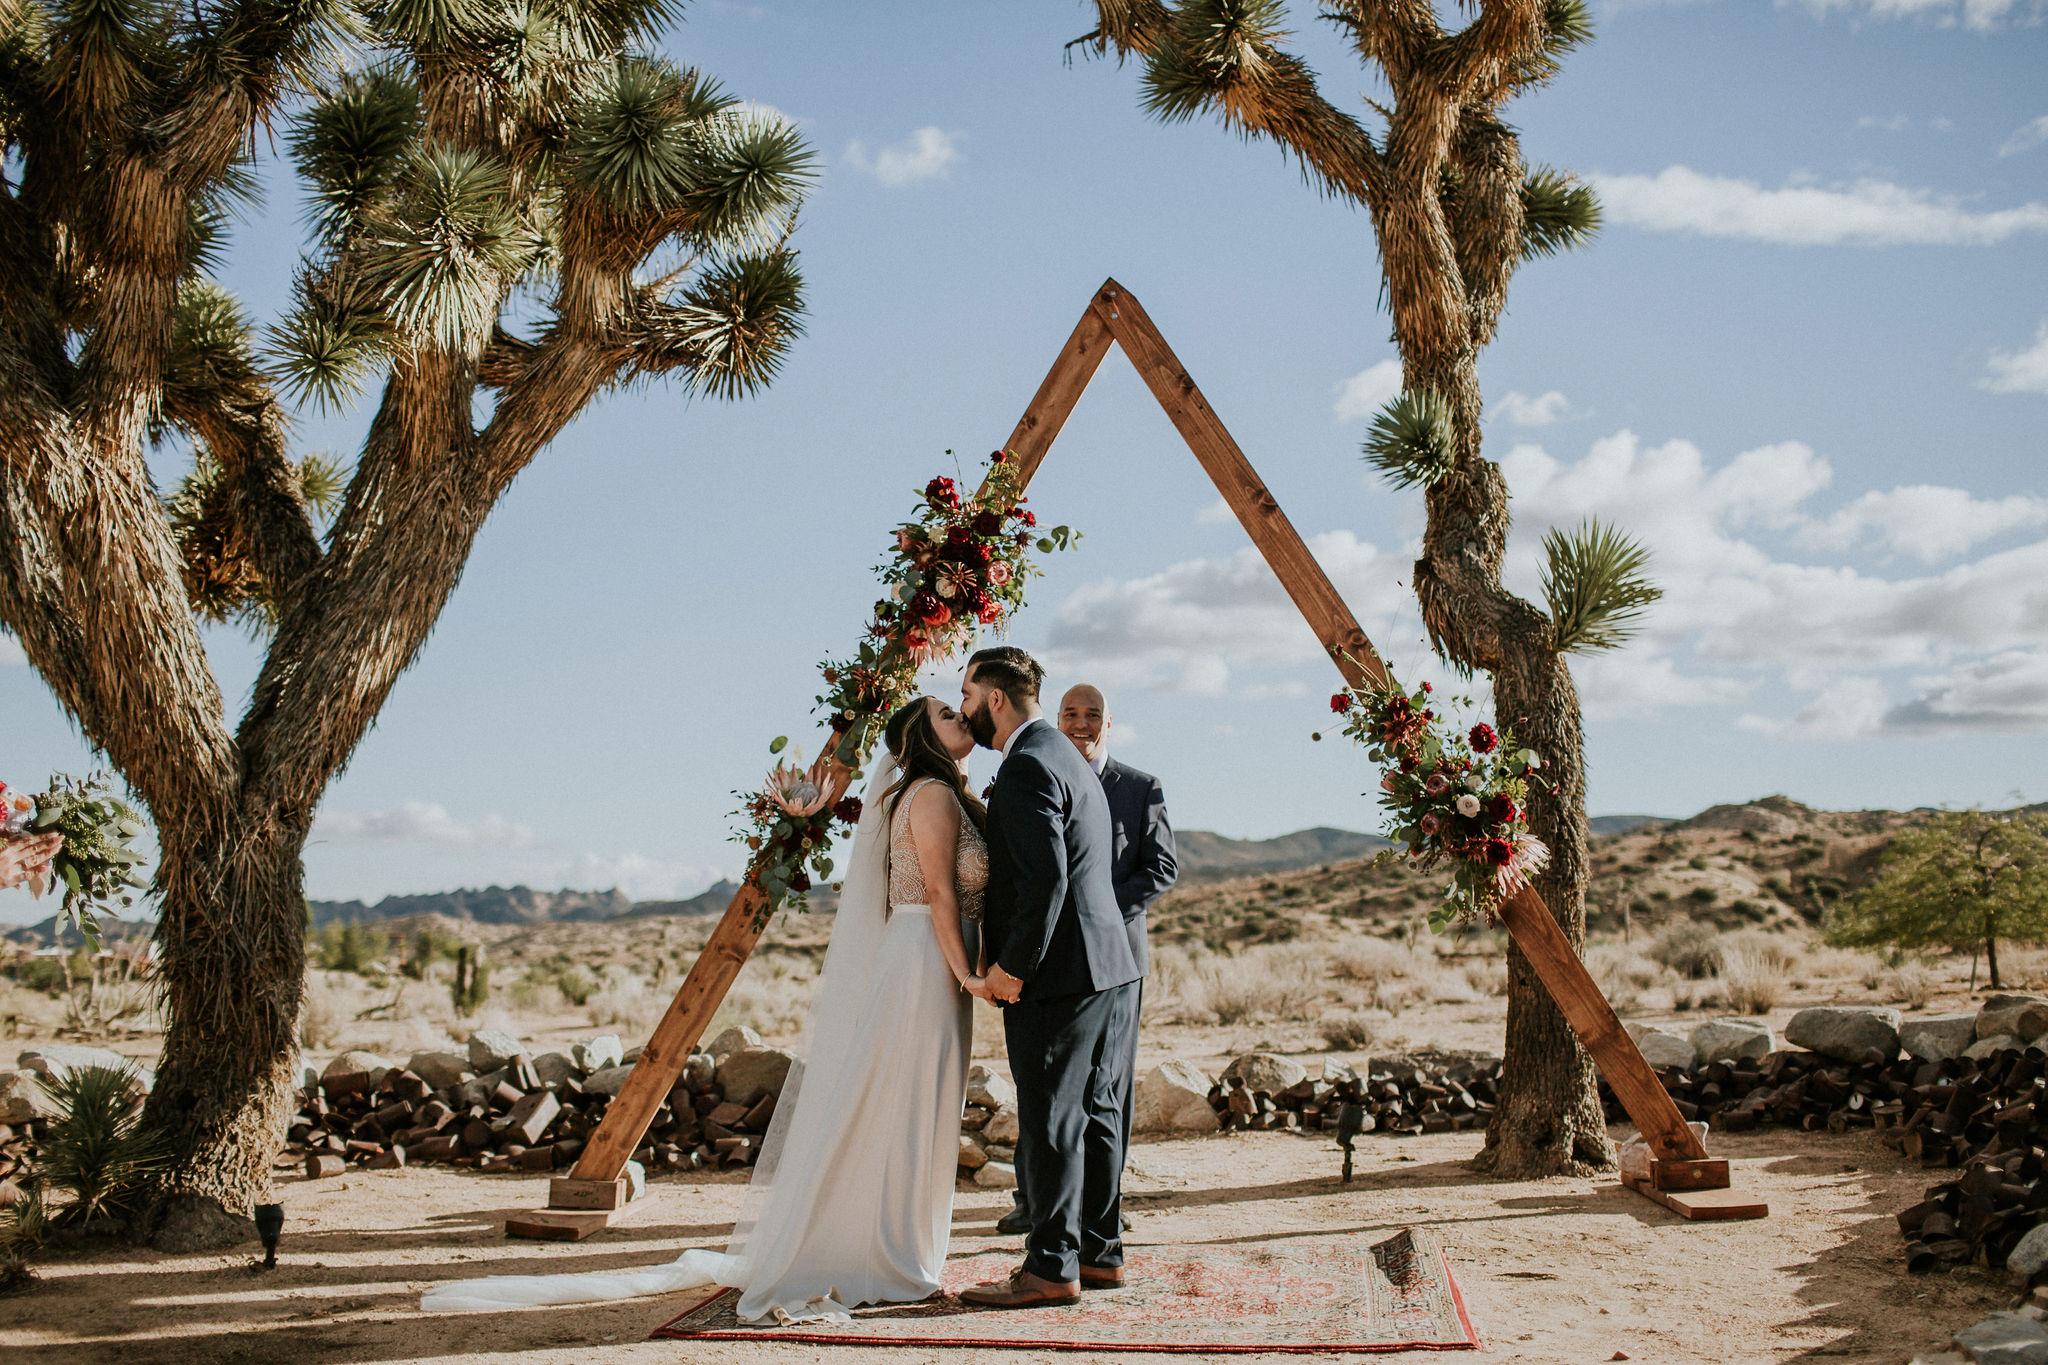 RimrockRanch-JoshuaTree-Wedding-Jami-Laree-379.jpg